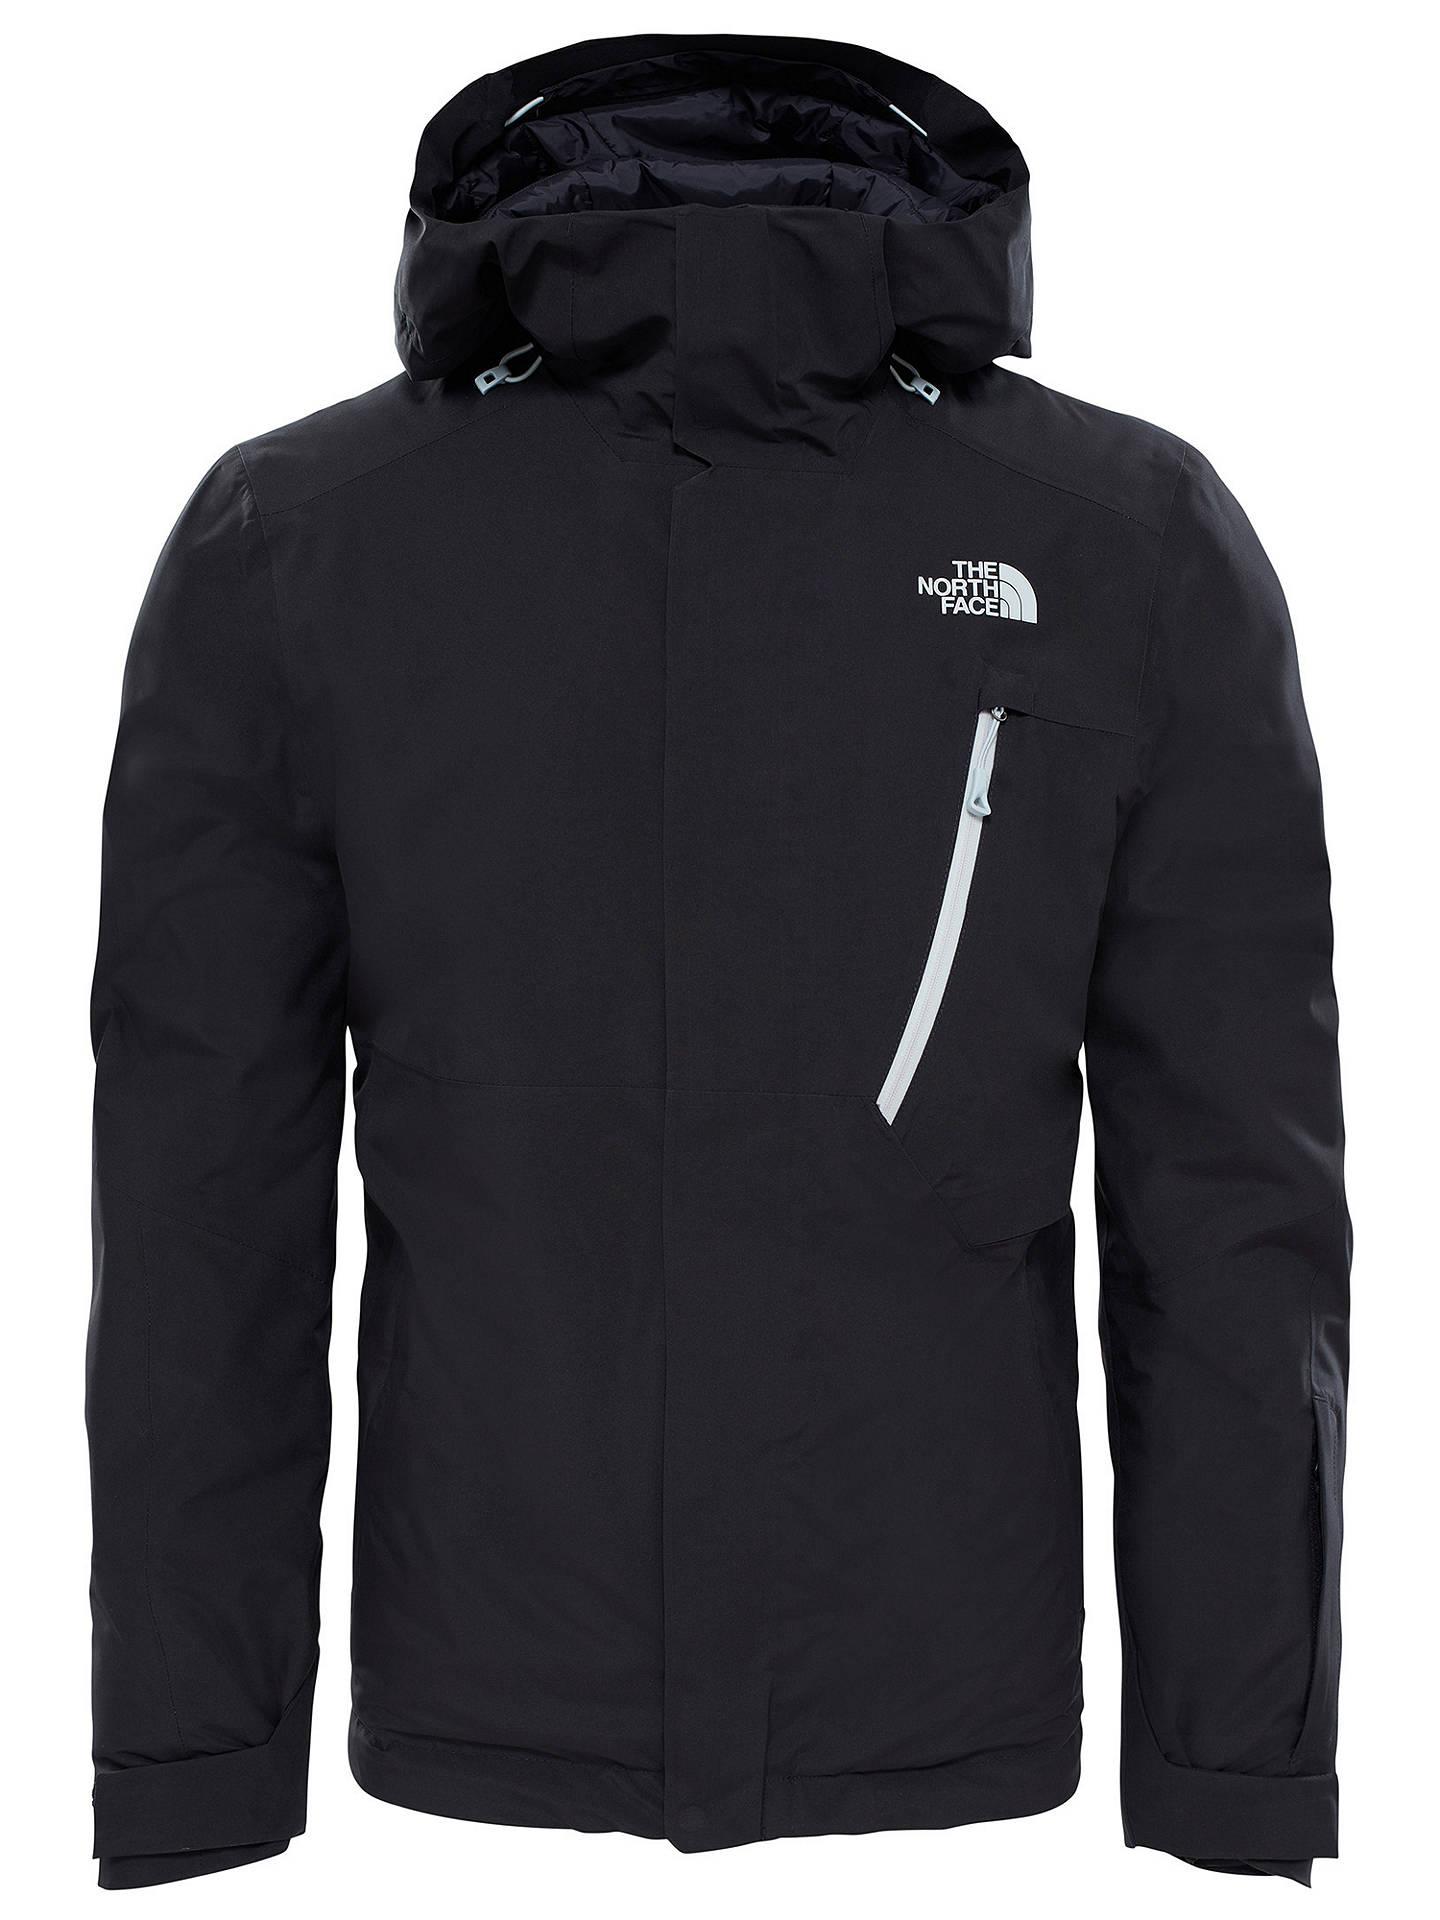 b675e1f4b The North Face Descendit Waterproof Men's Jacket, Black at John ...